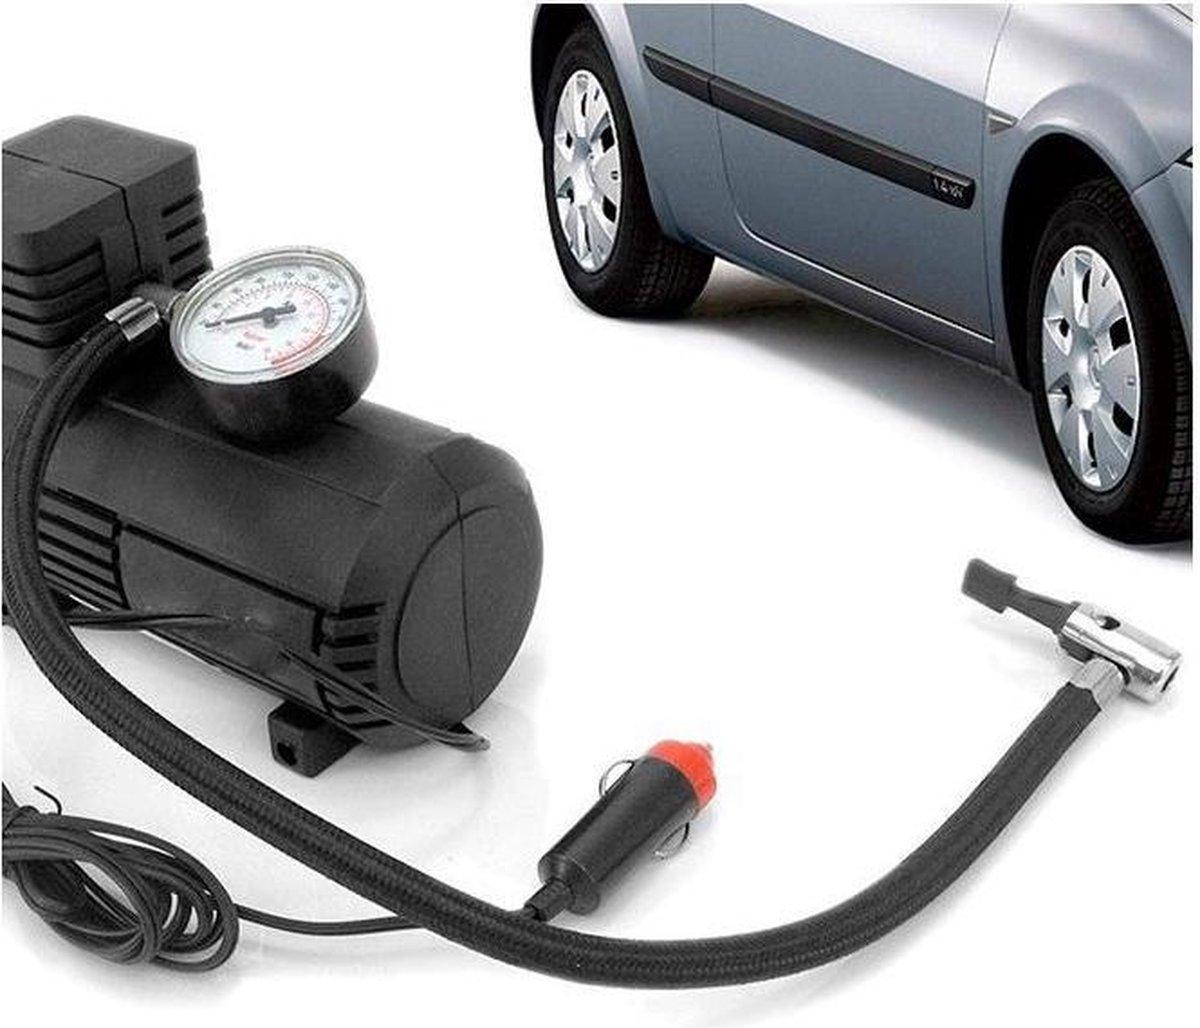 Luchtcompressor 12V incl. accessoires - compressor voor de auto